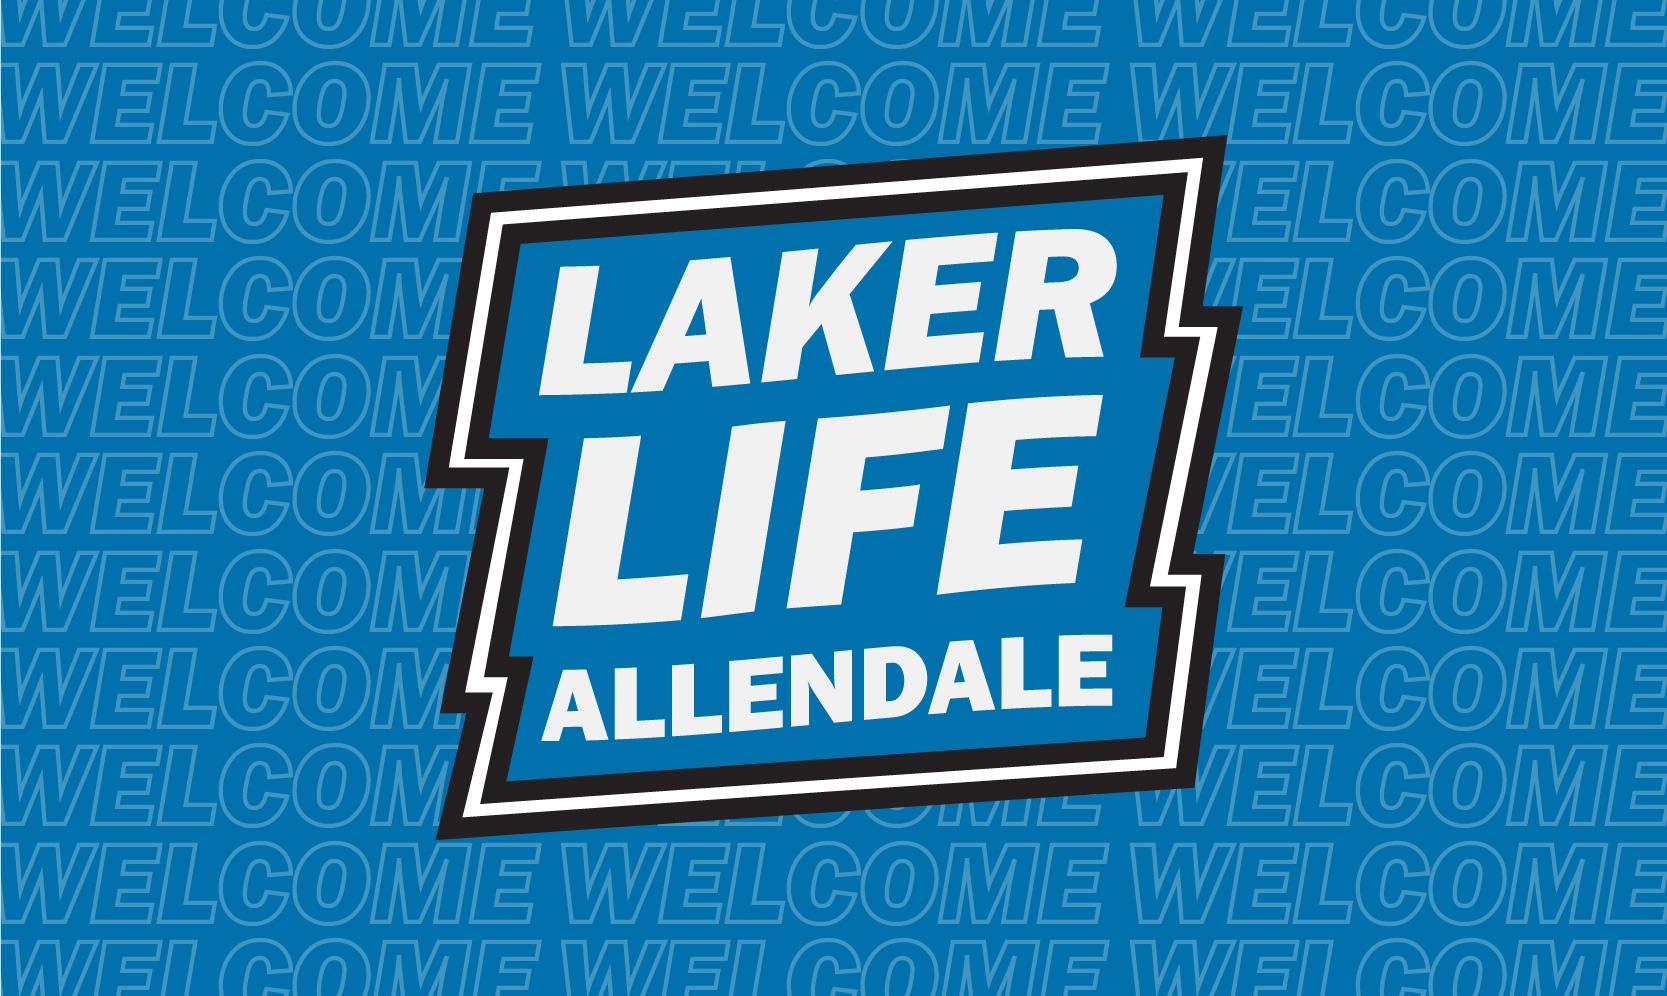 LakerLifeAllendale